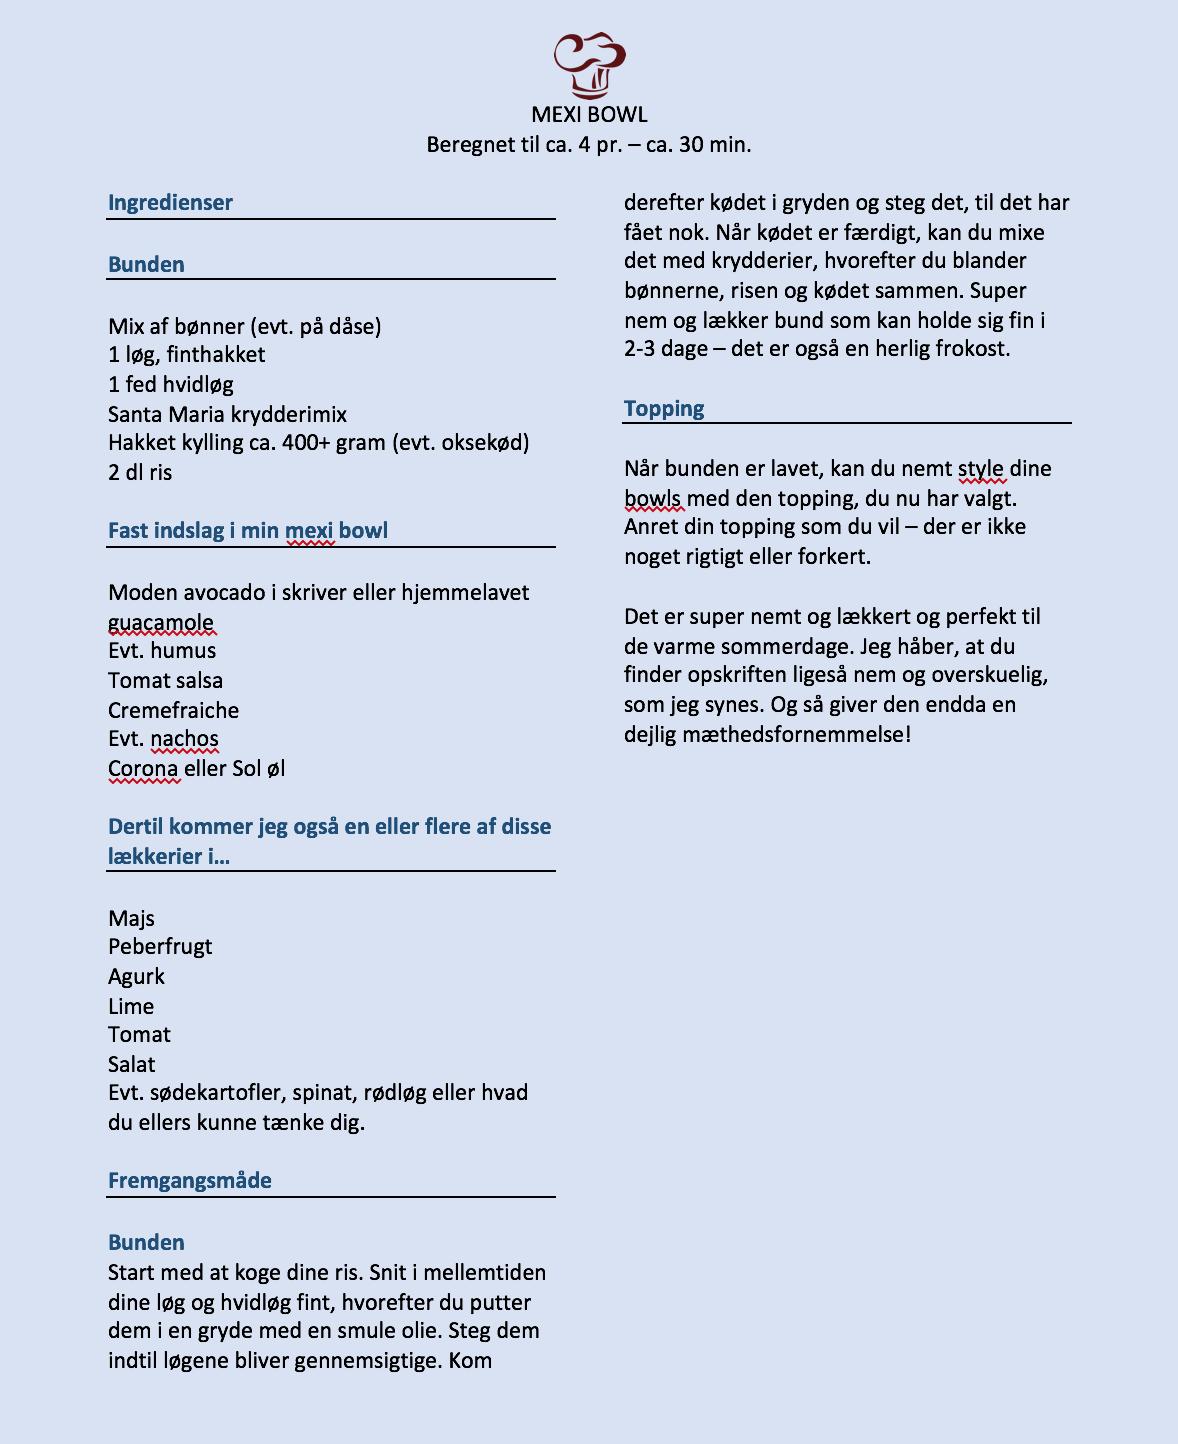 skaermbillede-2018-05-30-09-28-26